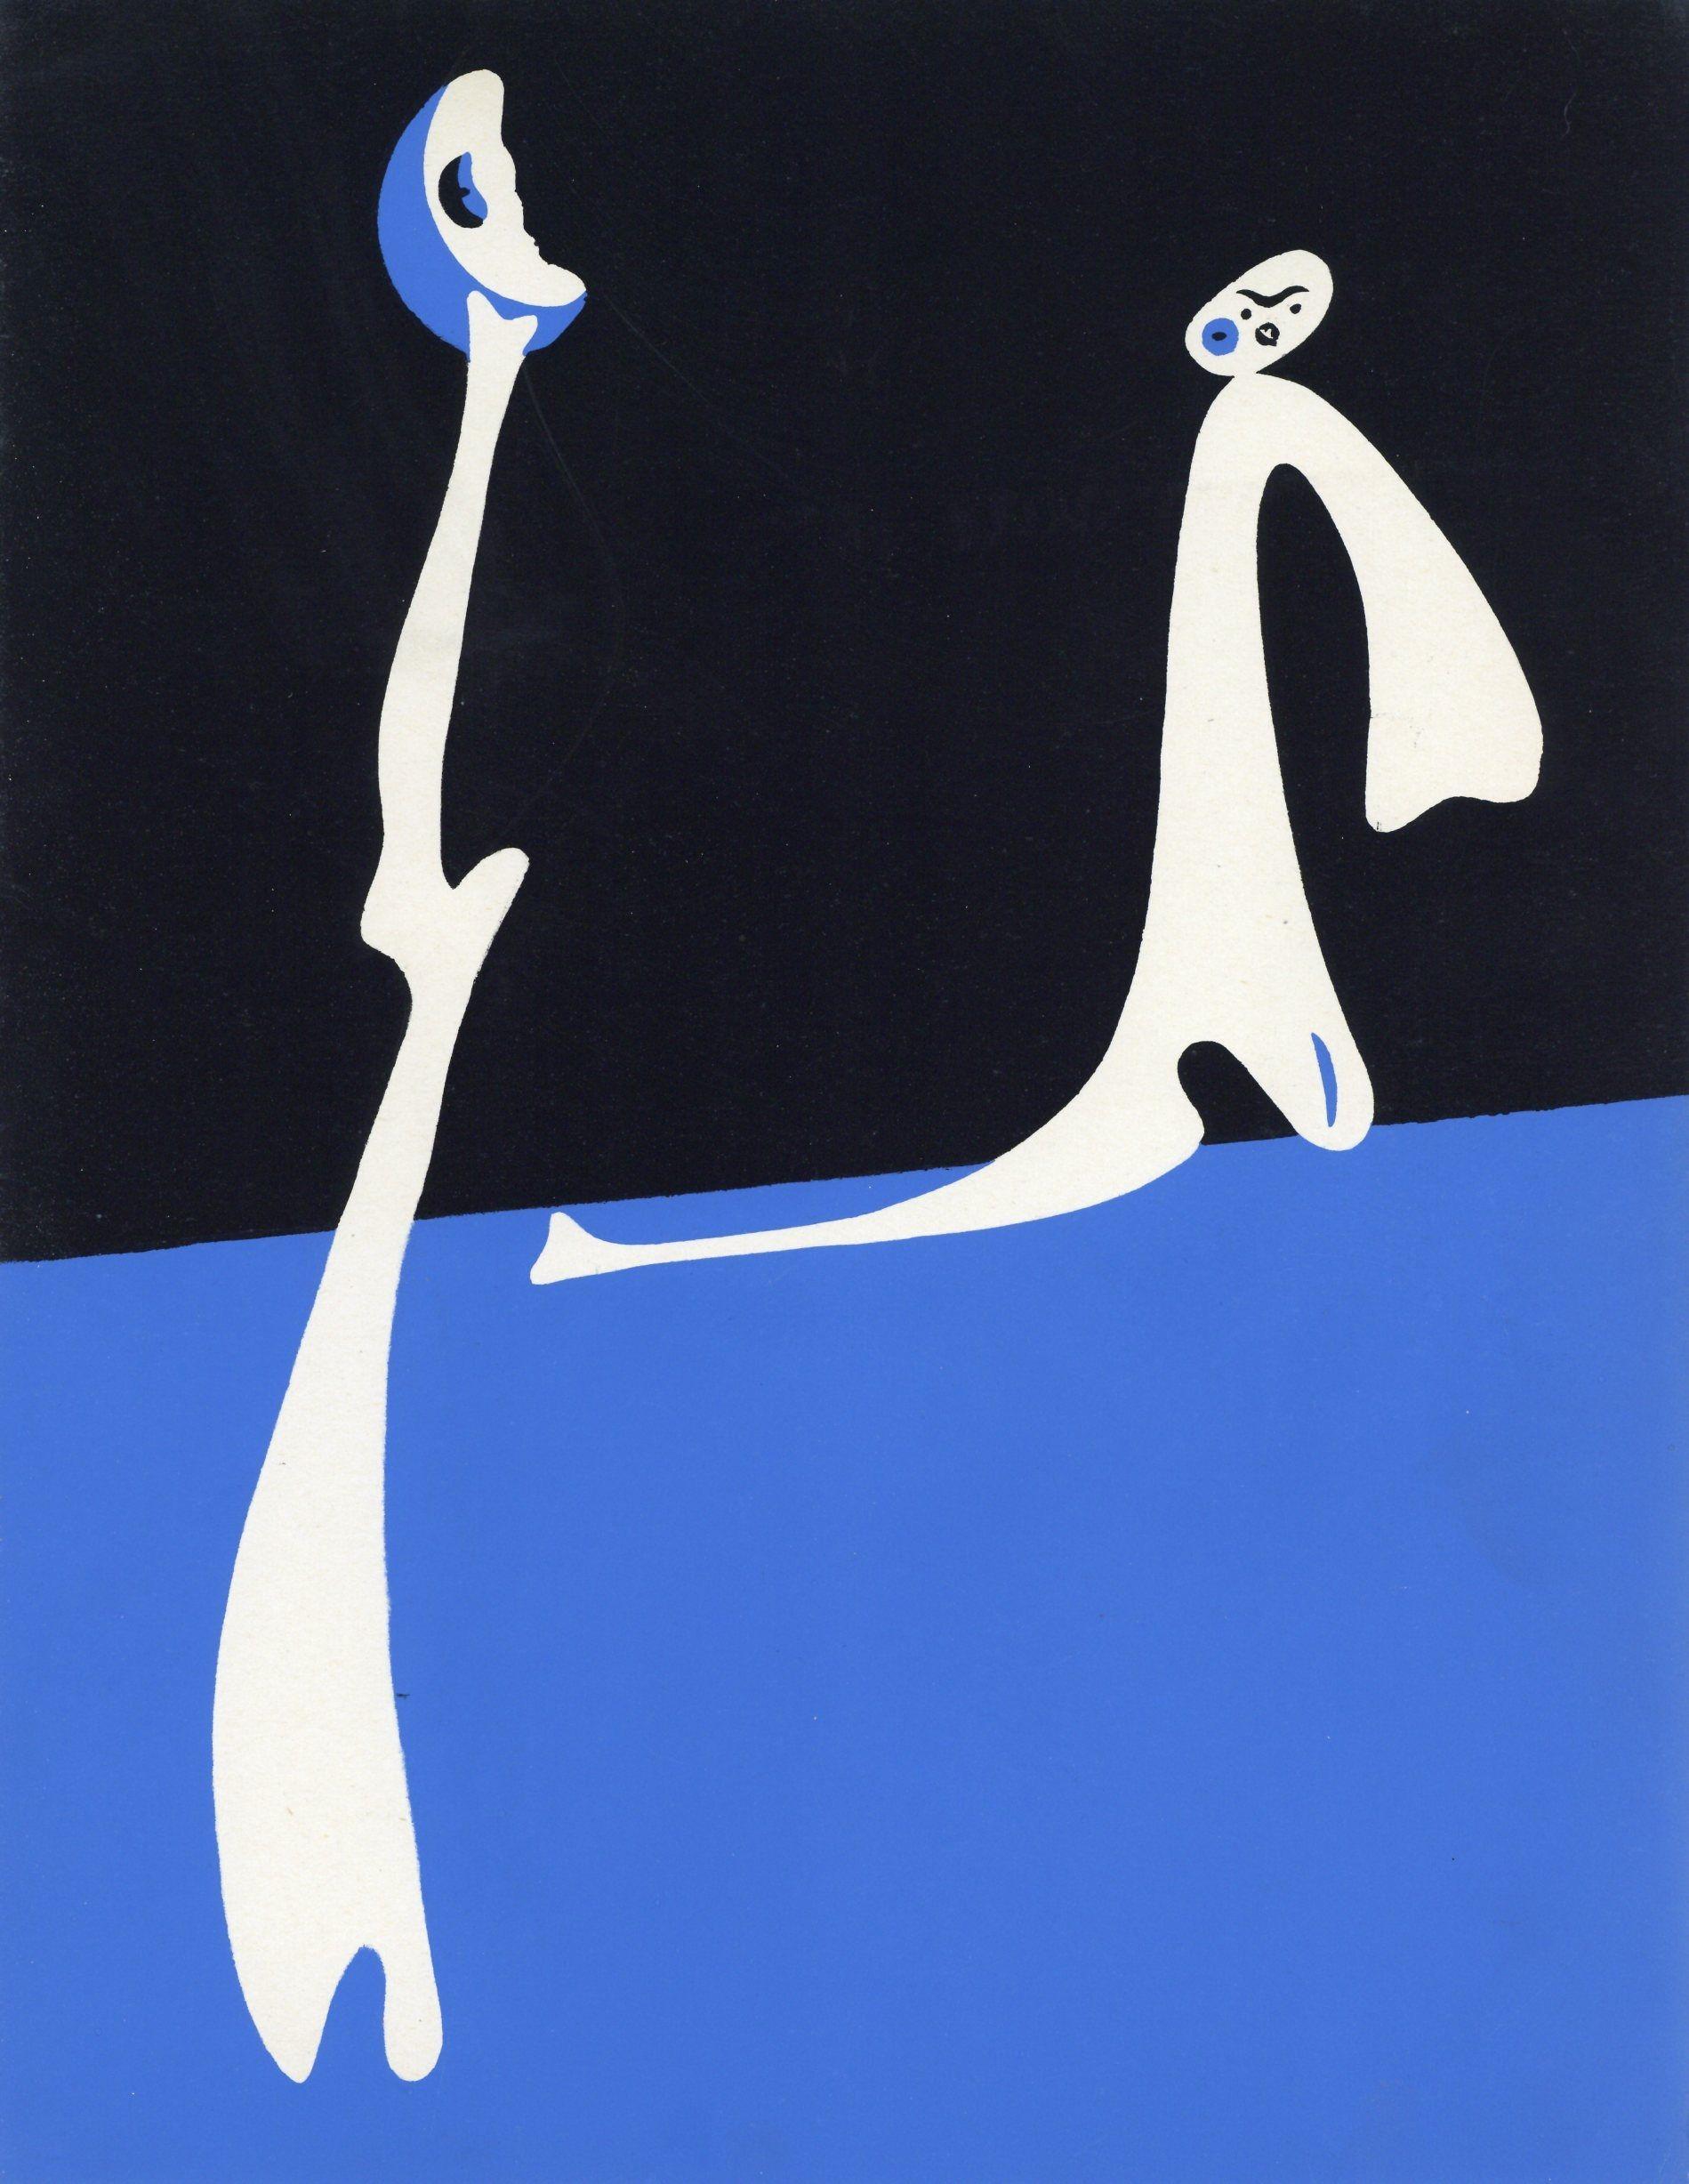 Joan Miro - Cahiers d'Art II, 1934